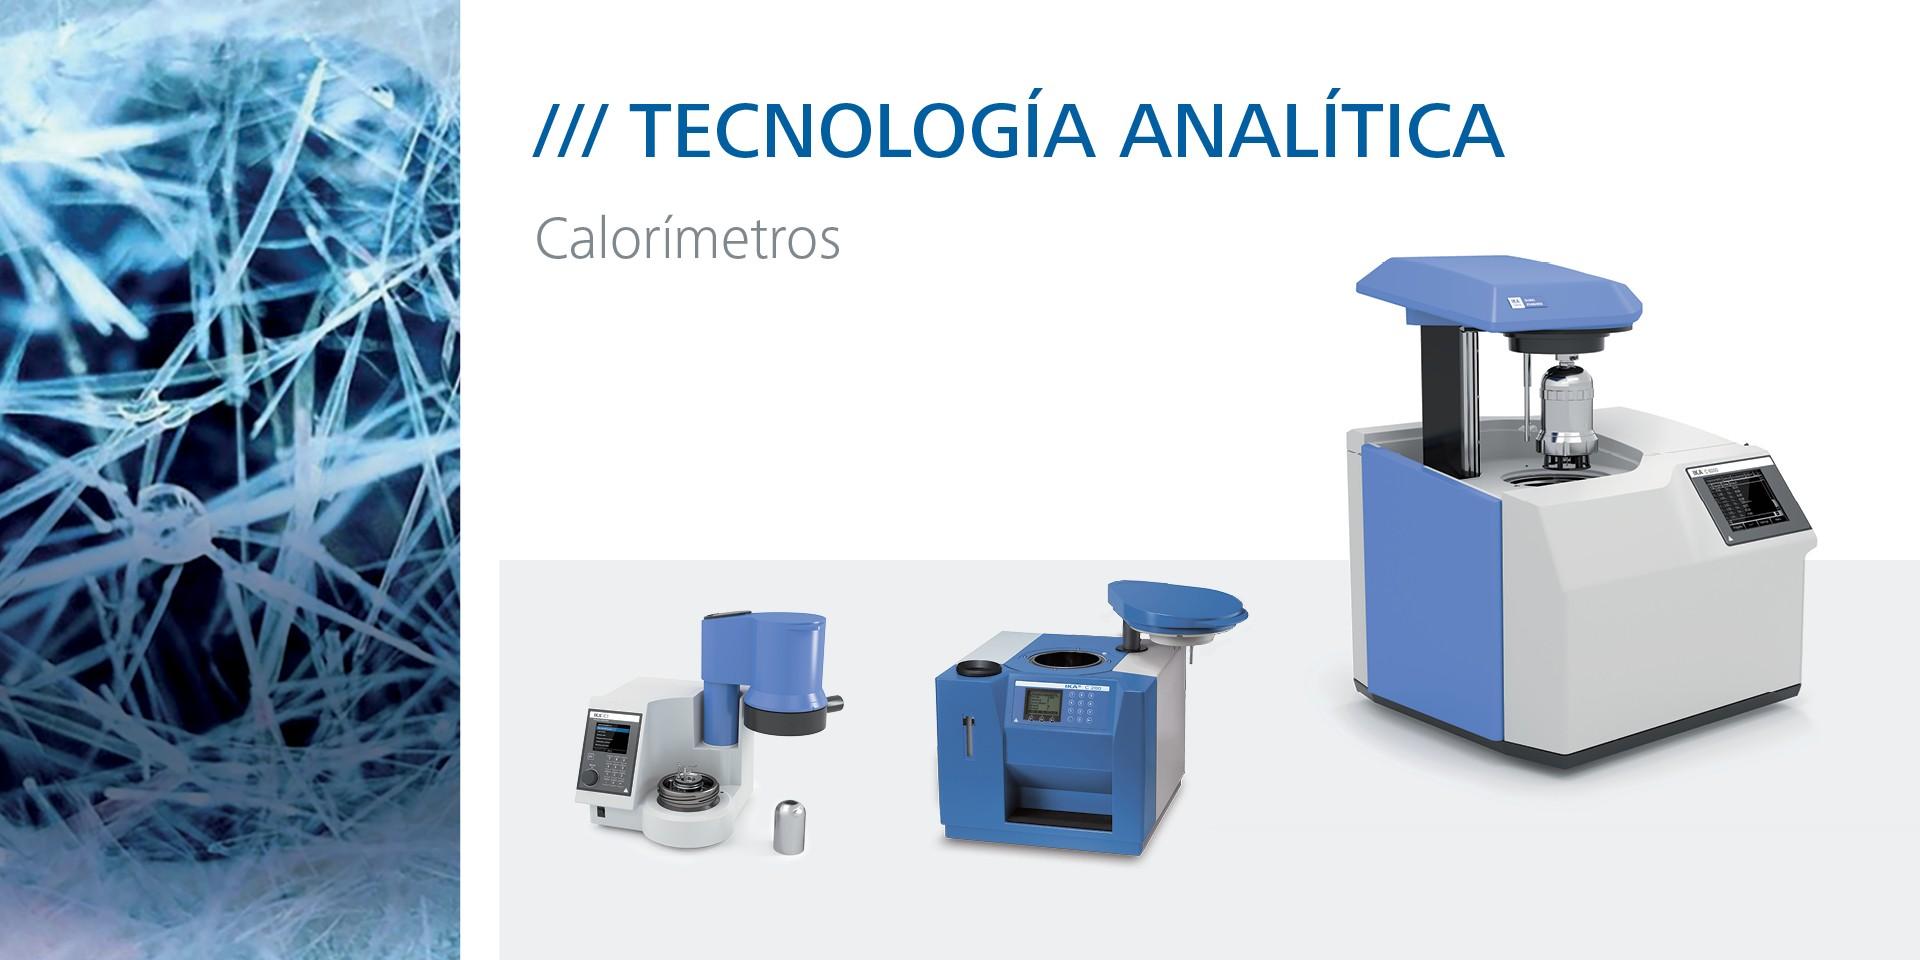 calorimetros,bomba calorimetrica